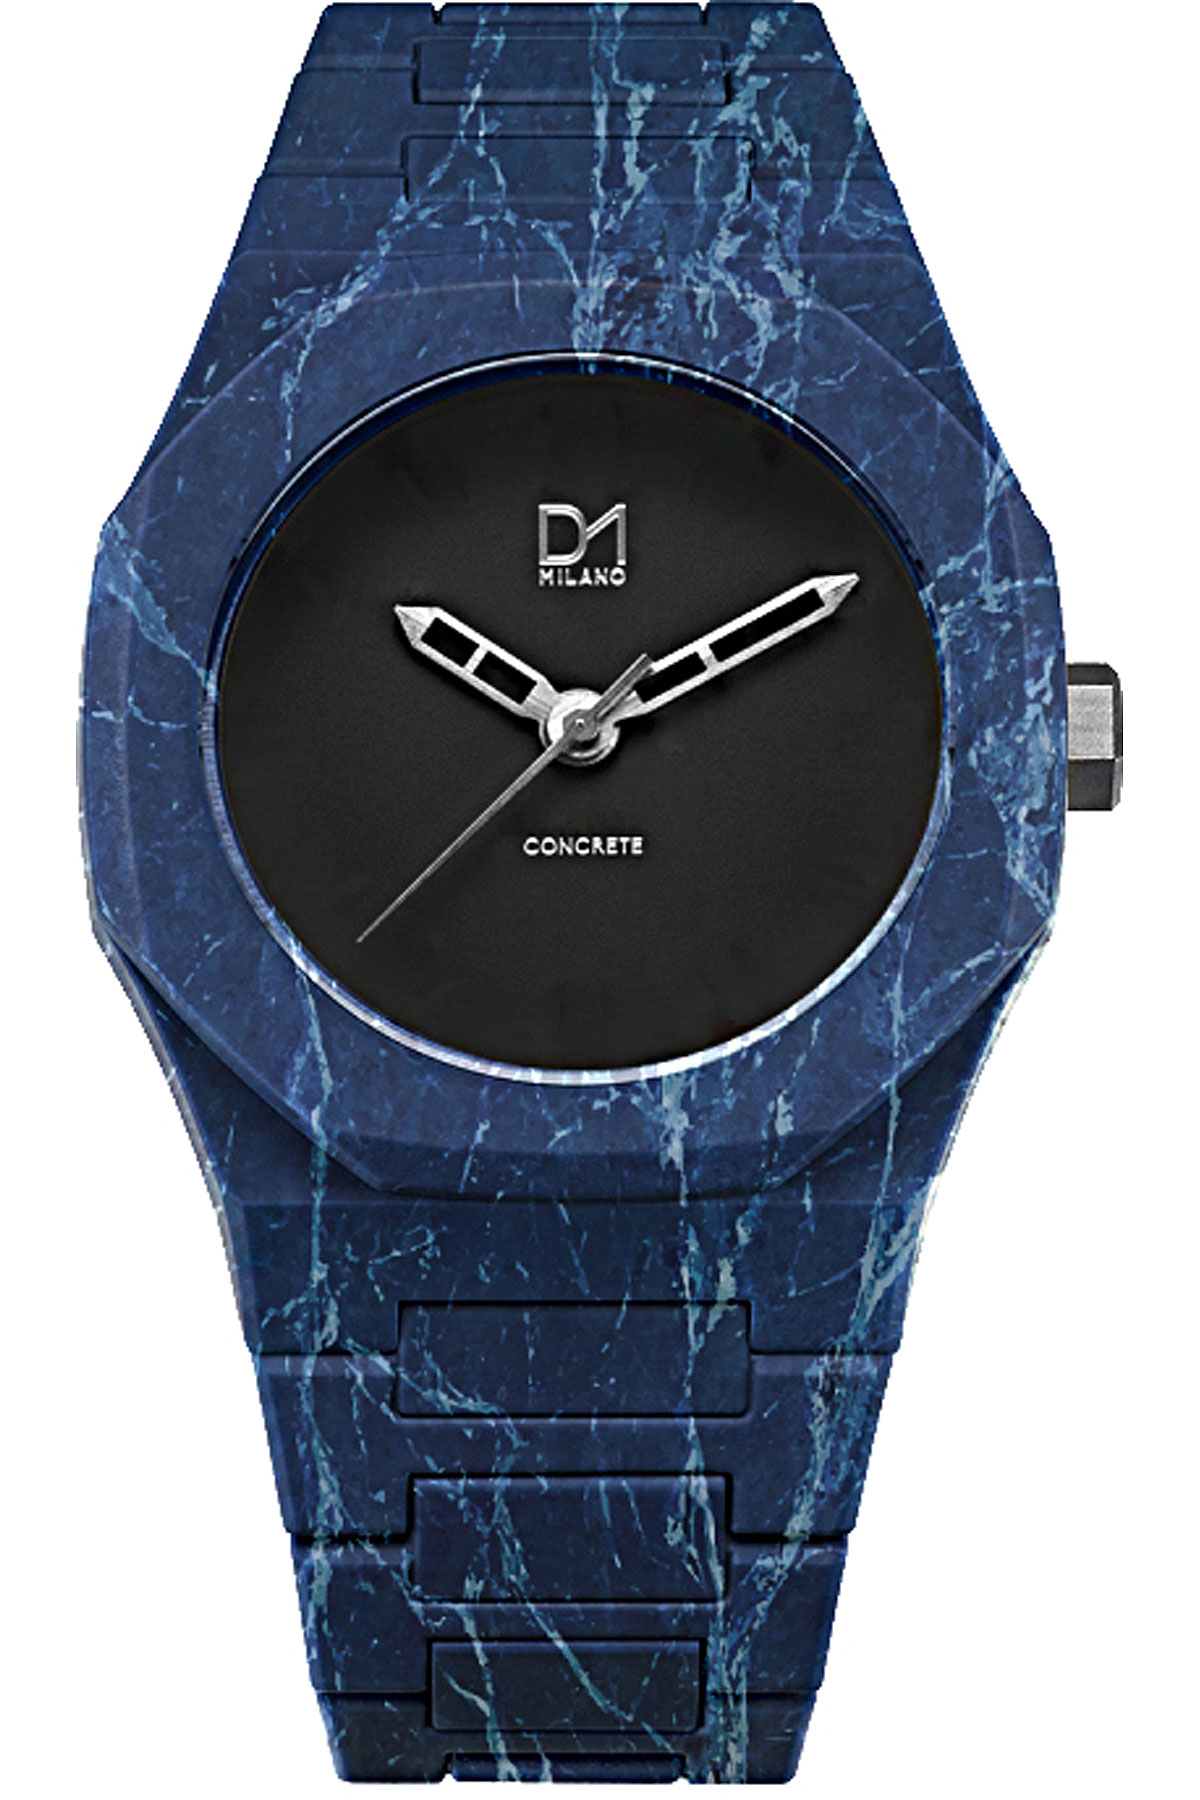 D1 Milano Watch for Men, Blue, Polycarbonate, 2019